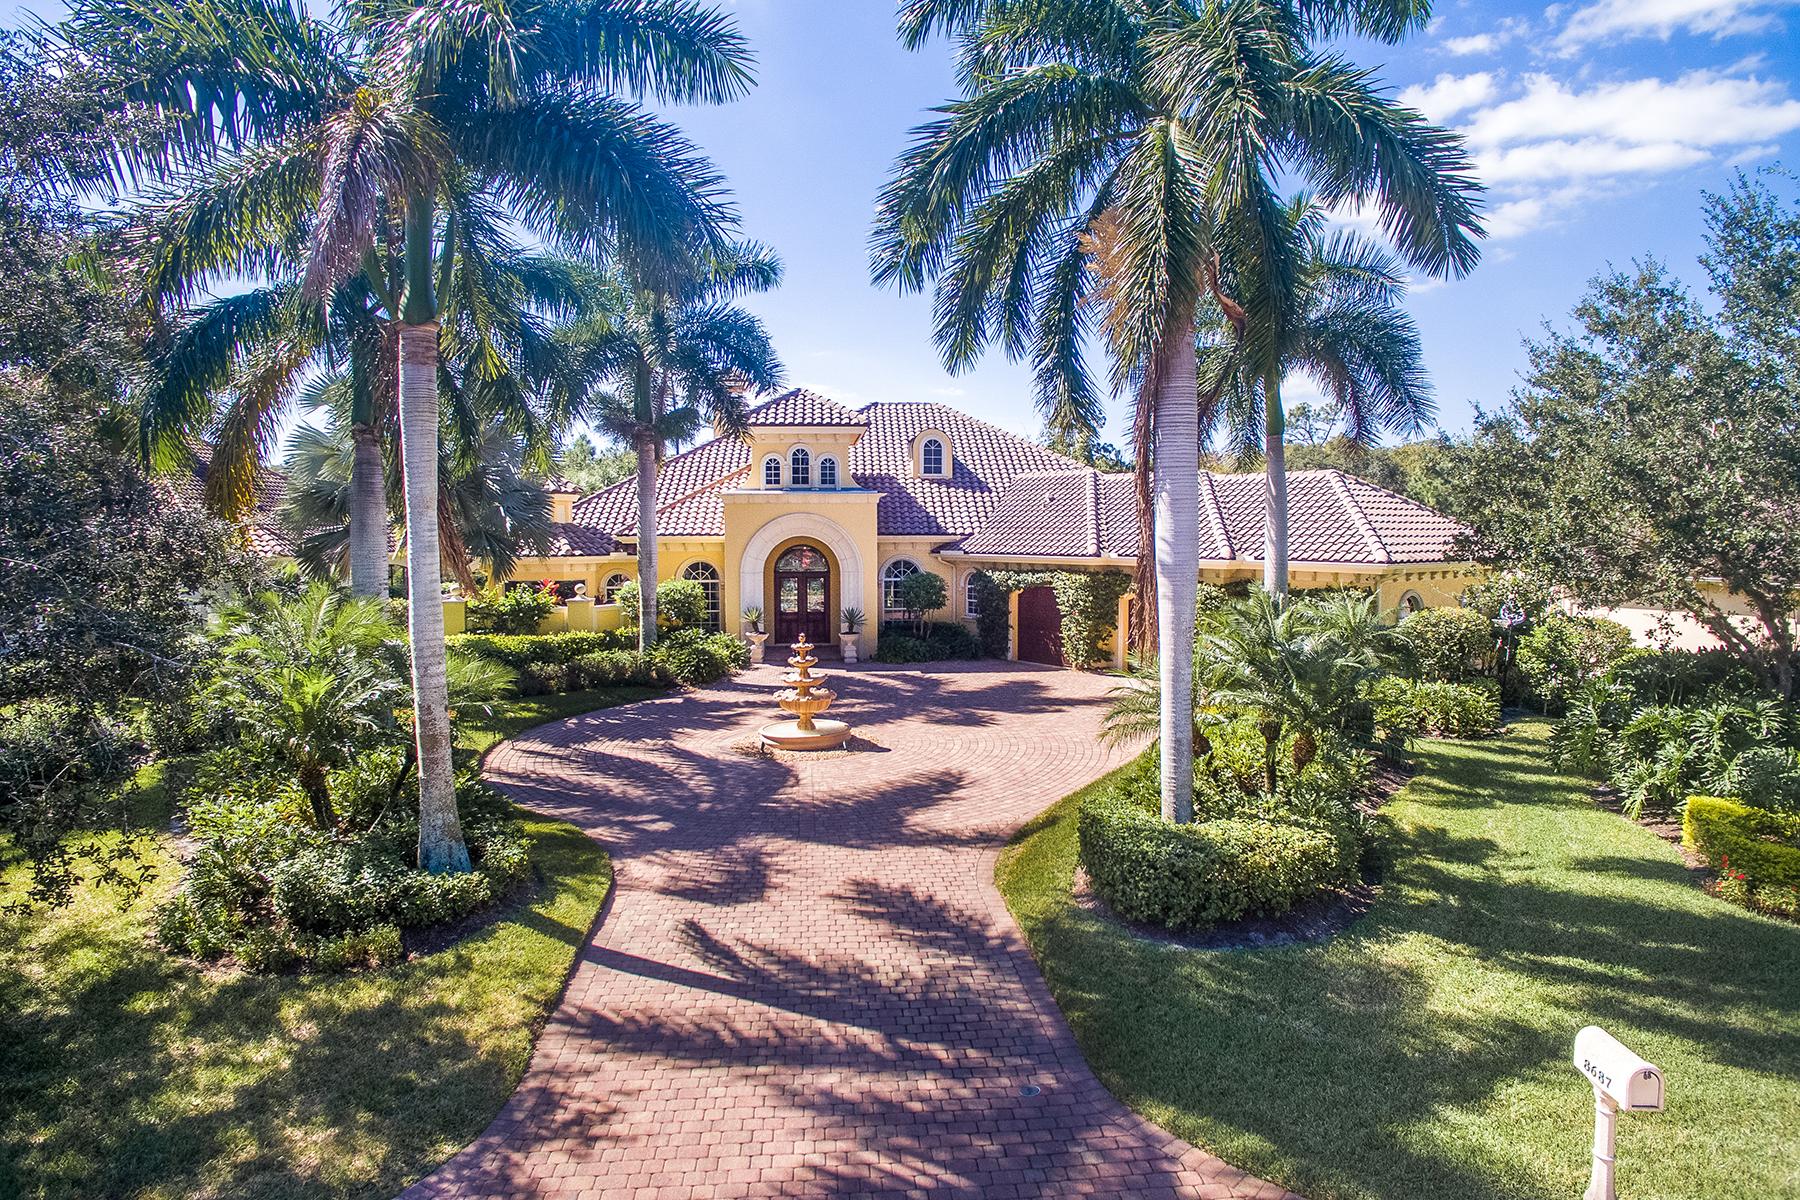 獨棟家庭住宅 為 出售 在 PELICAN MARSH - BAY LAUREL ESTATES 8687 Purslane Dr Naples, 佛羅里達州, 34109 美國